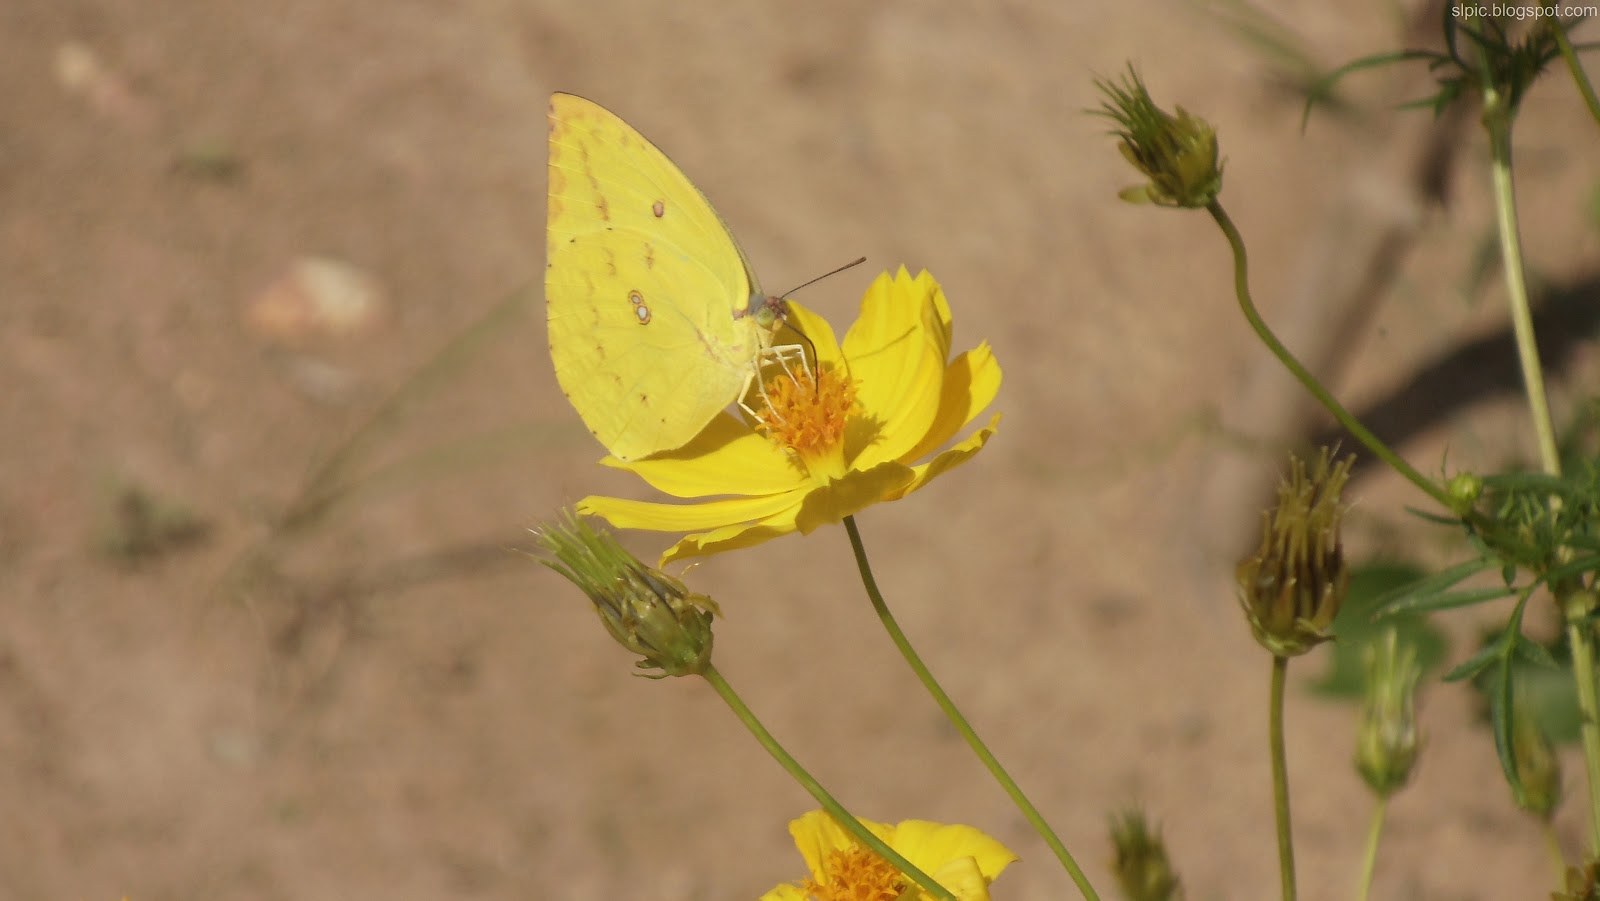 http://1.bp.blogspot.com/-72owAxu5GQE/UBImyljDXdI/AAAAAAAAKkY/ohfdv1OA2AU/s1600/Srilanka+Various+Flowers+And+Nature++(14).JPG